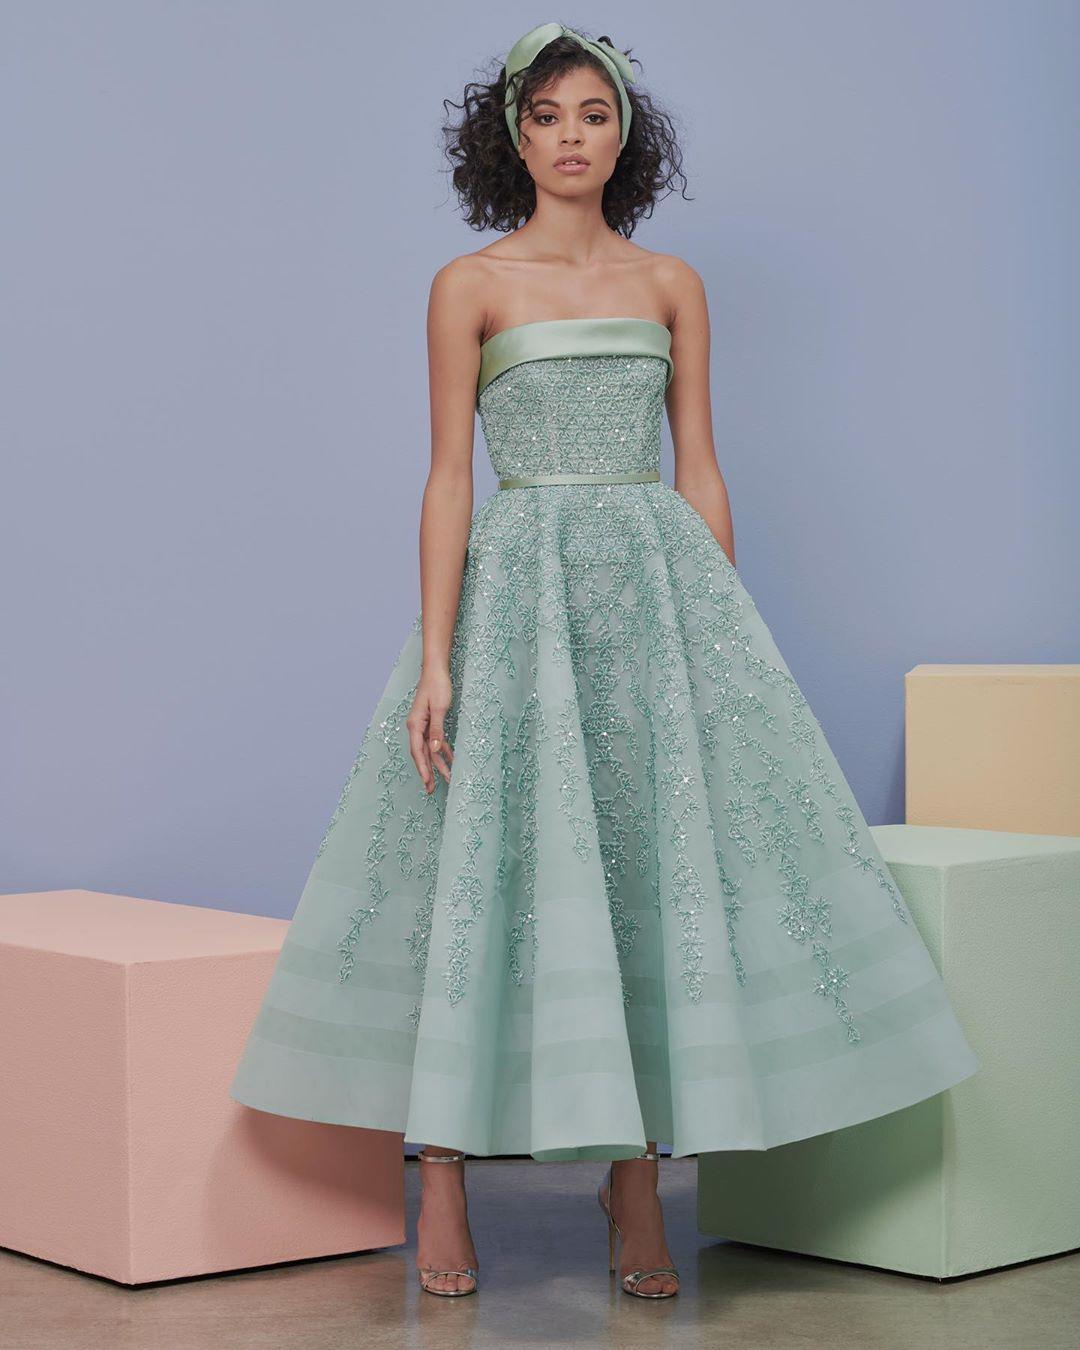 Rami Al Ali Official On Instagram Rami Al Ali Proudly Presents The Spring Summer 2020 Pret A Porter Collect Fashion Design Dress Types Of Dresses Rami Al Ali